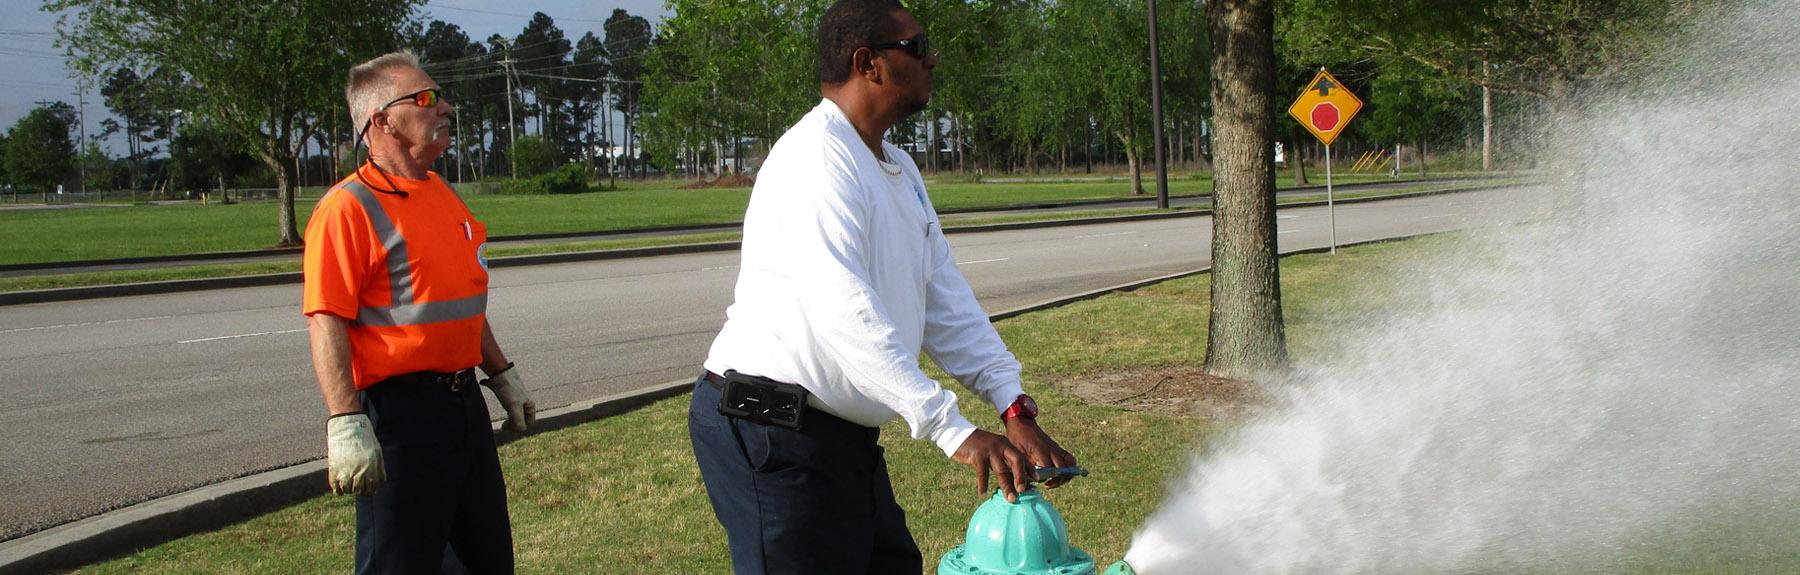 Hydrant Maintenance